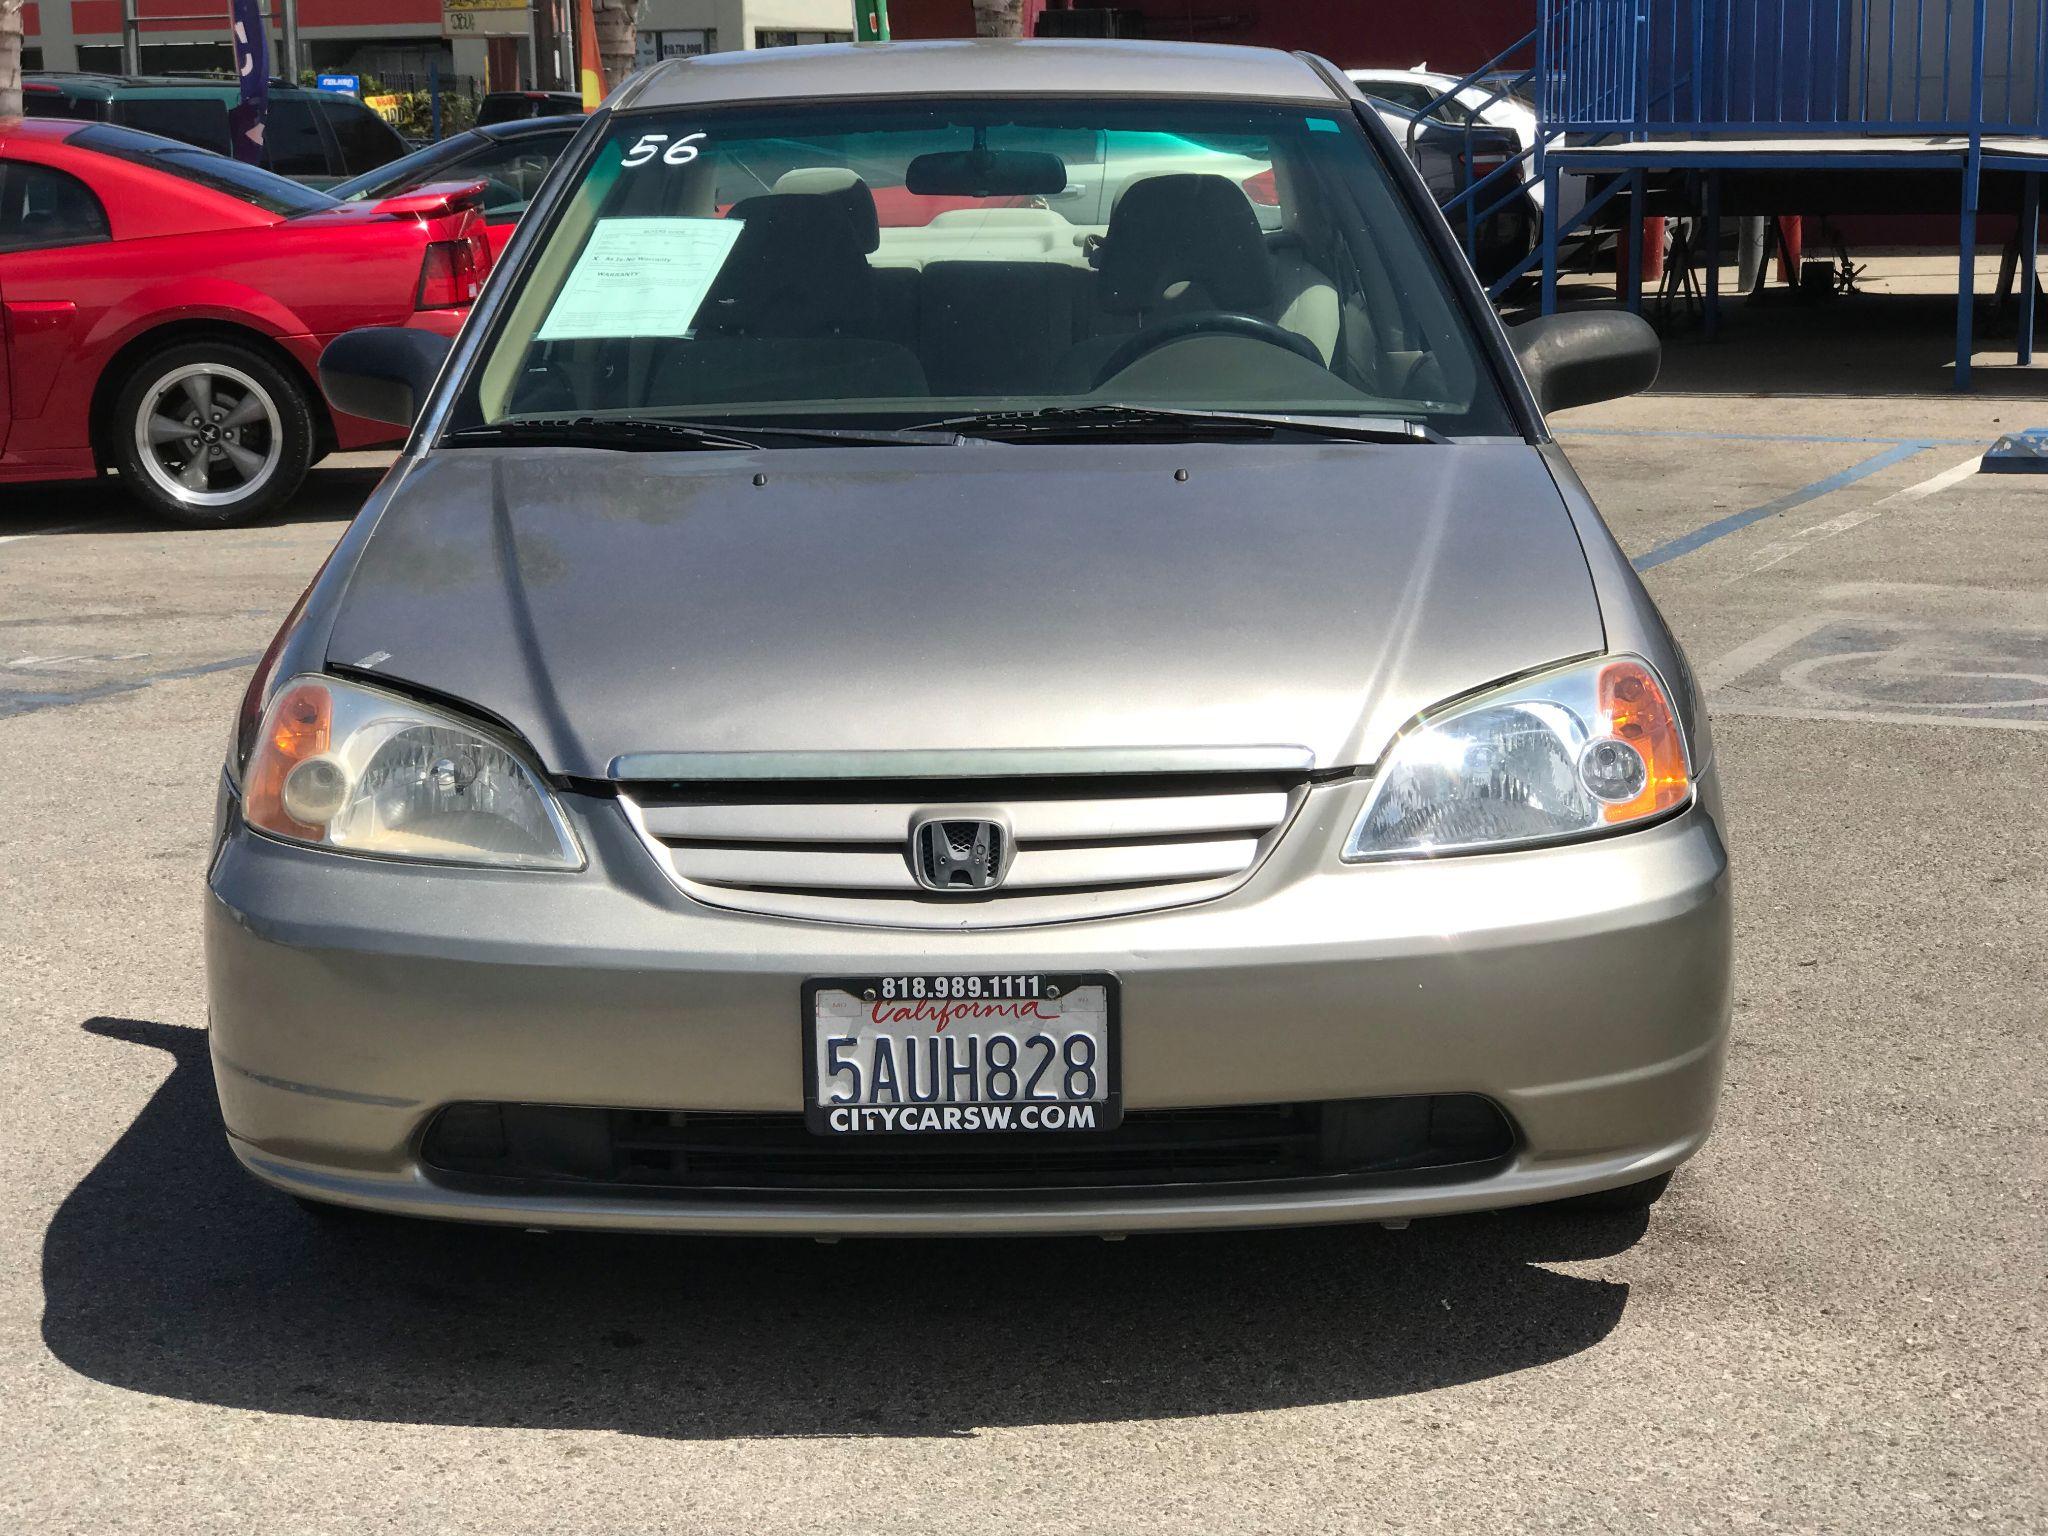 Used 2003 Honda Civic LX at City Cars Warehouse INC